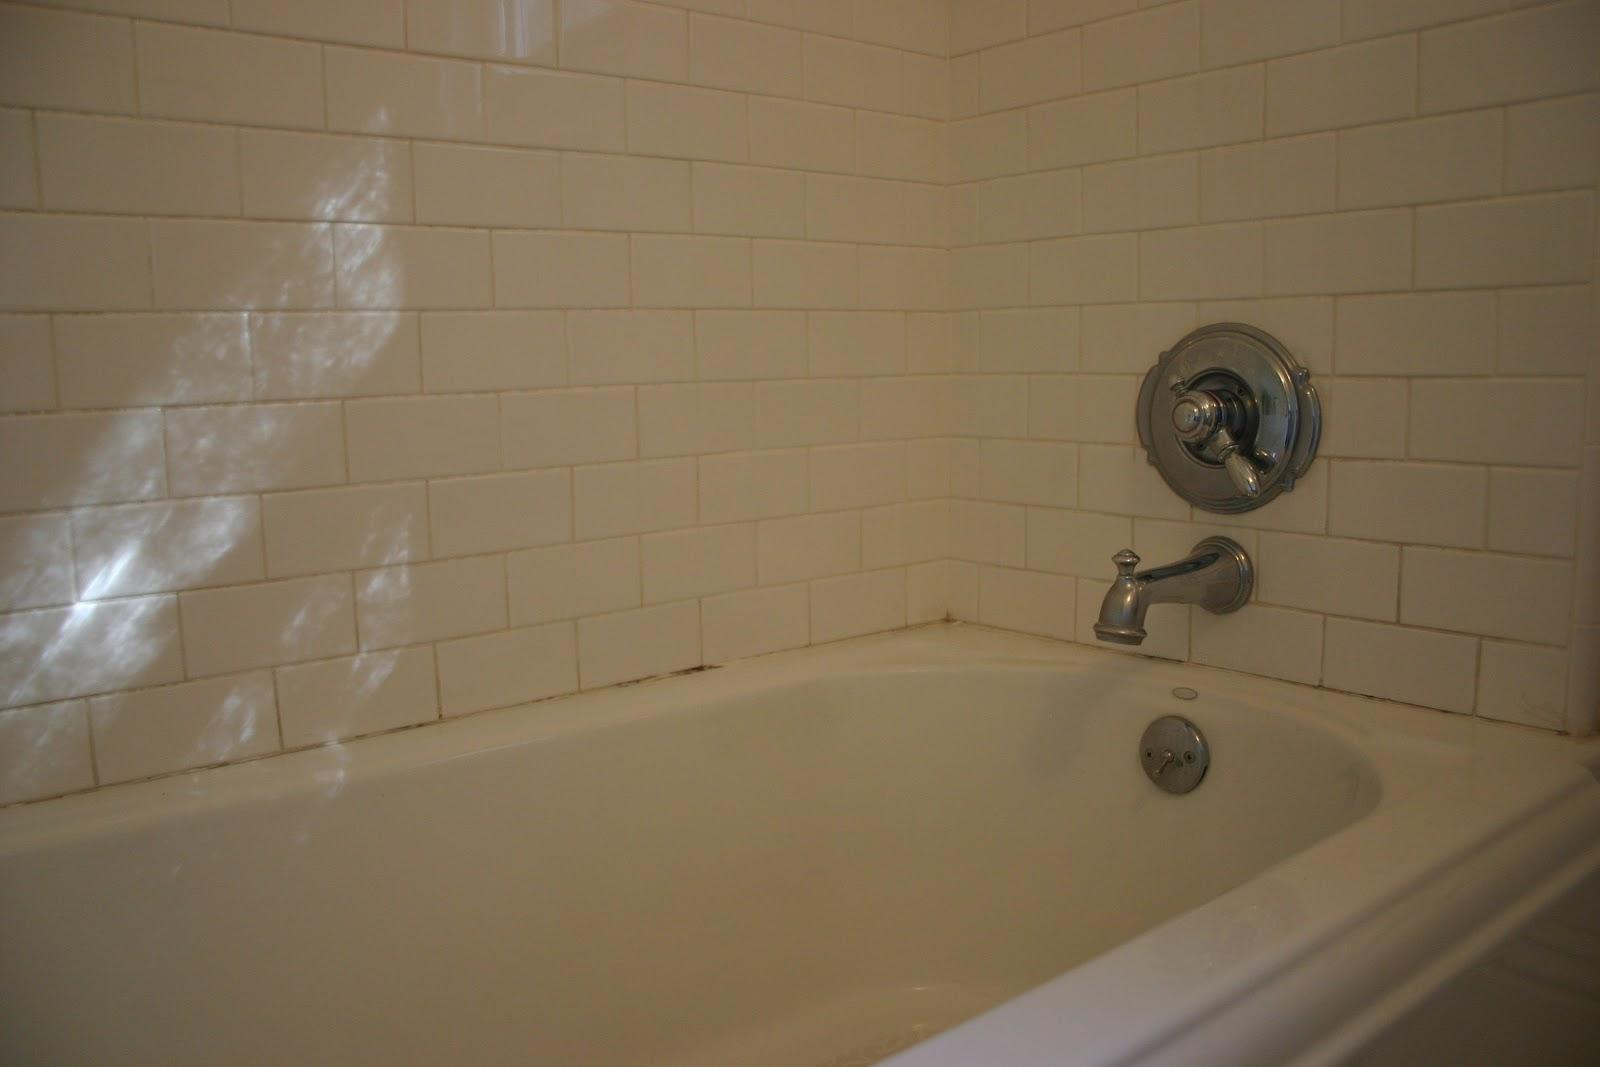 re-caulking bathtub Part - 19:  re-caulking bathtub awesome design